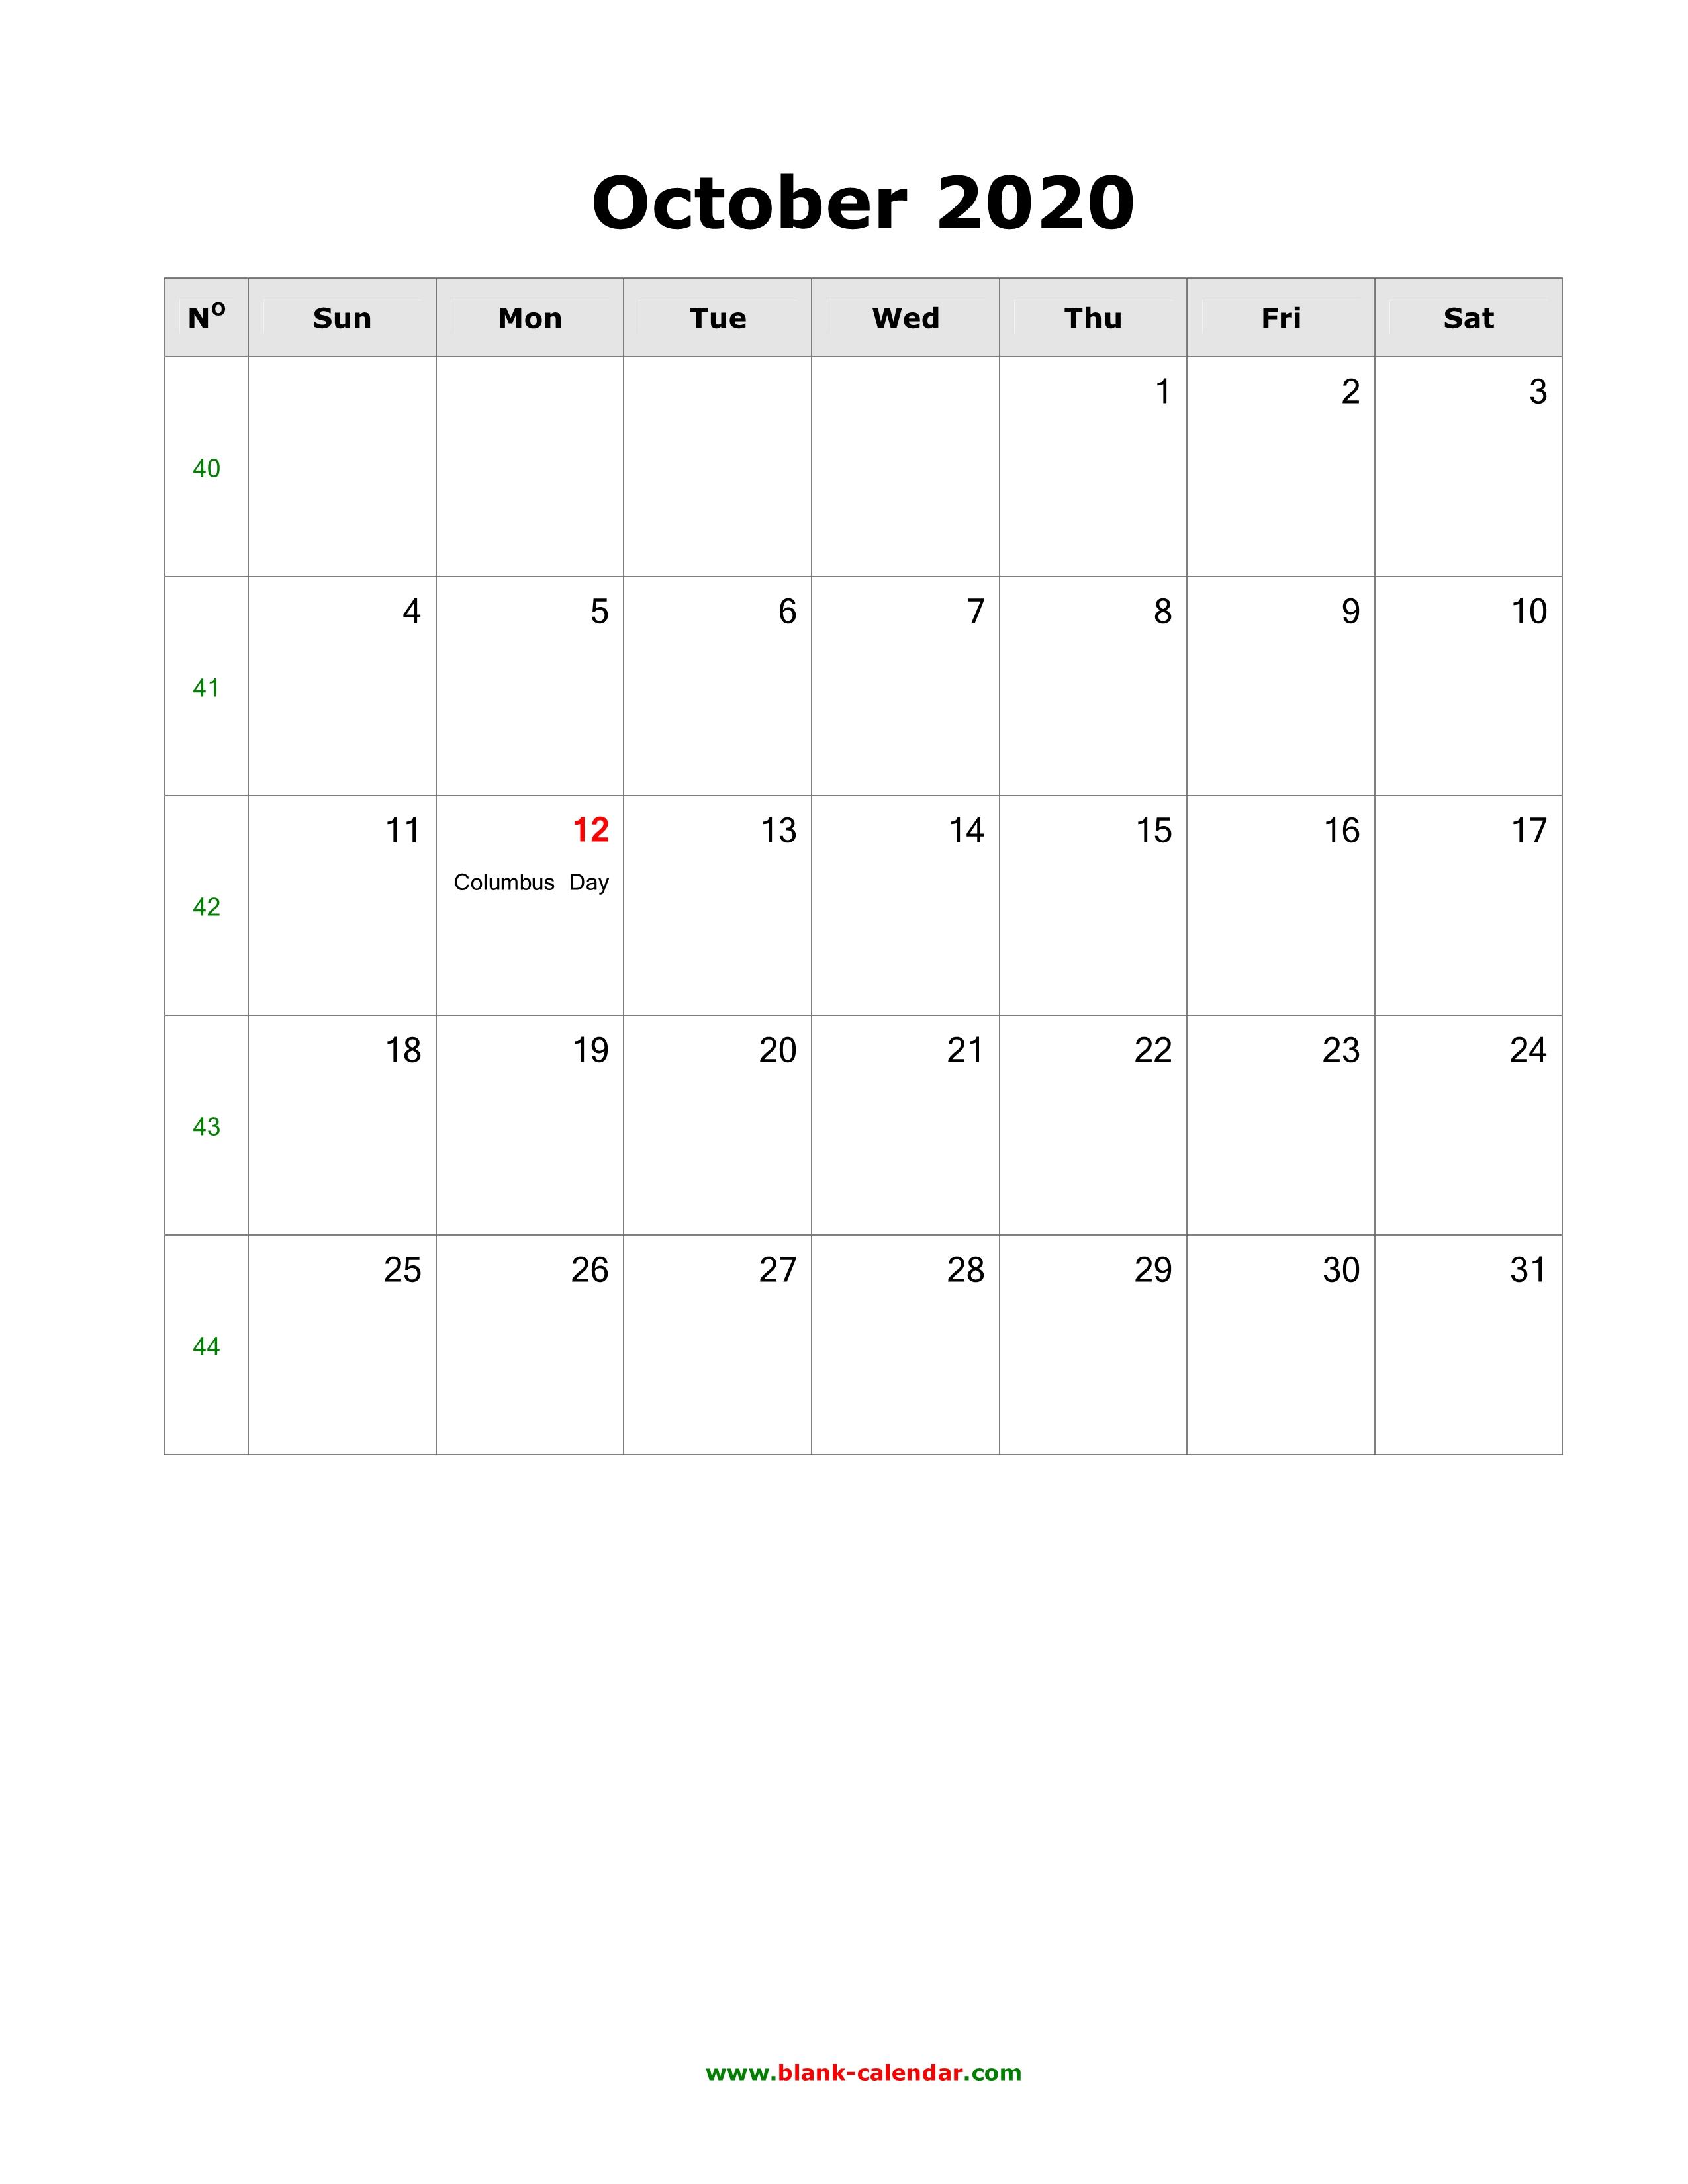 October 2020 Printable Calendar.Download October 2020 Blank Calendar With Us Holidays Vertical